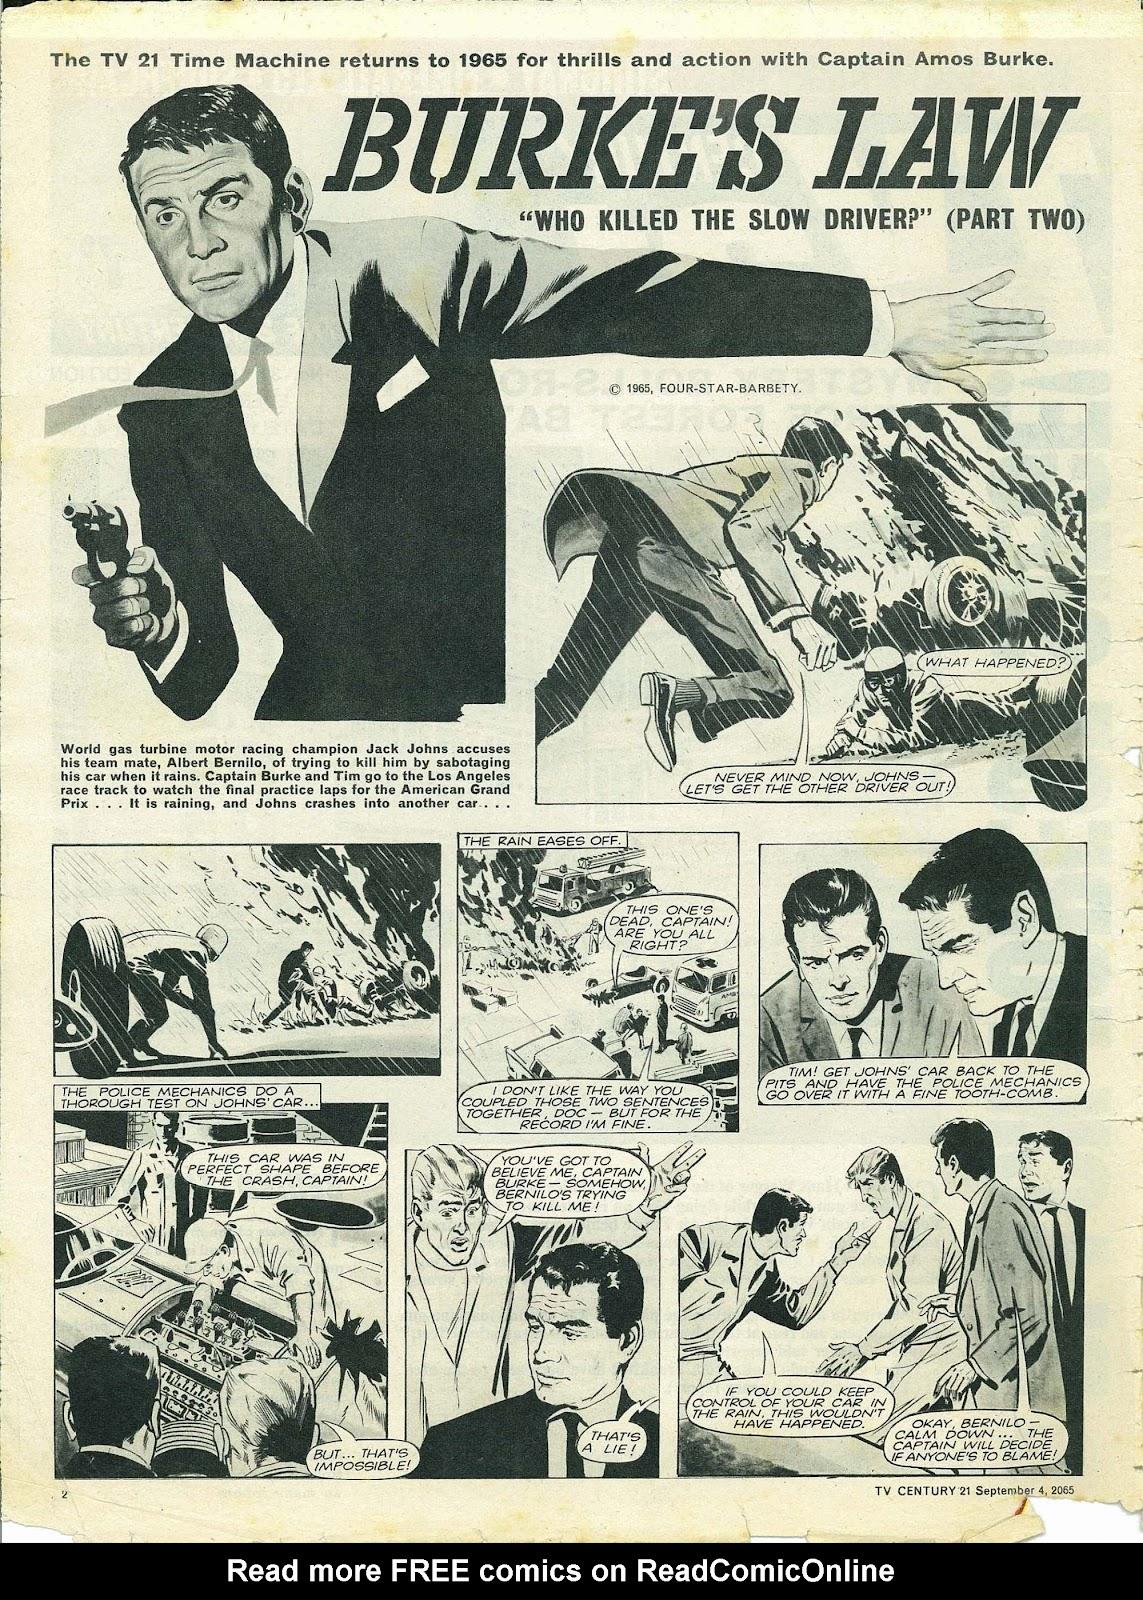 TV Century 21 (TV 21) issue 33 - Page 2